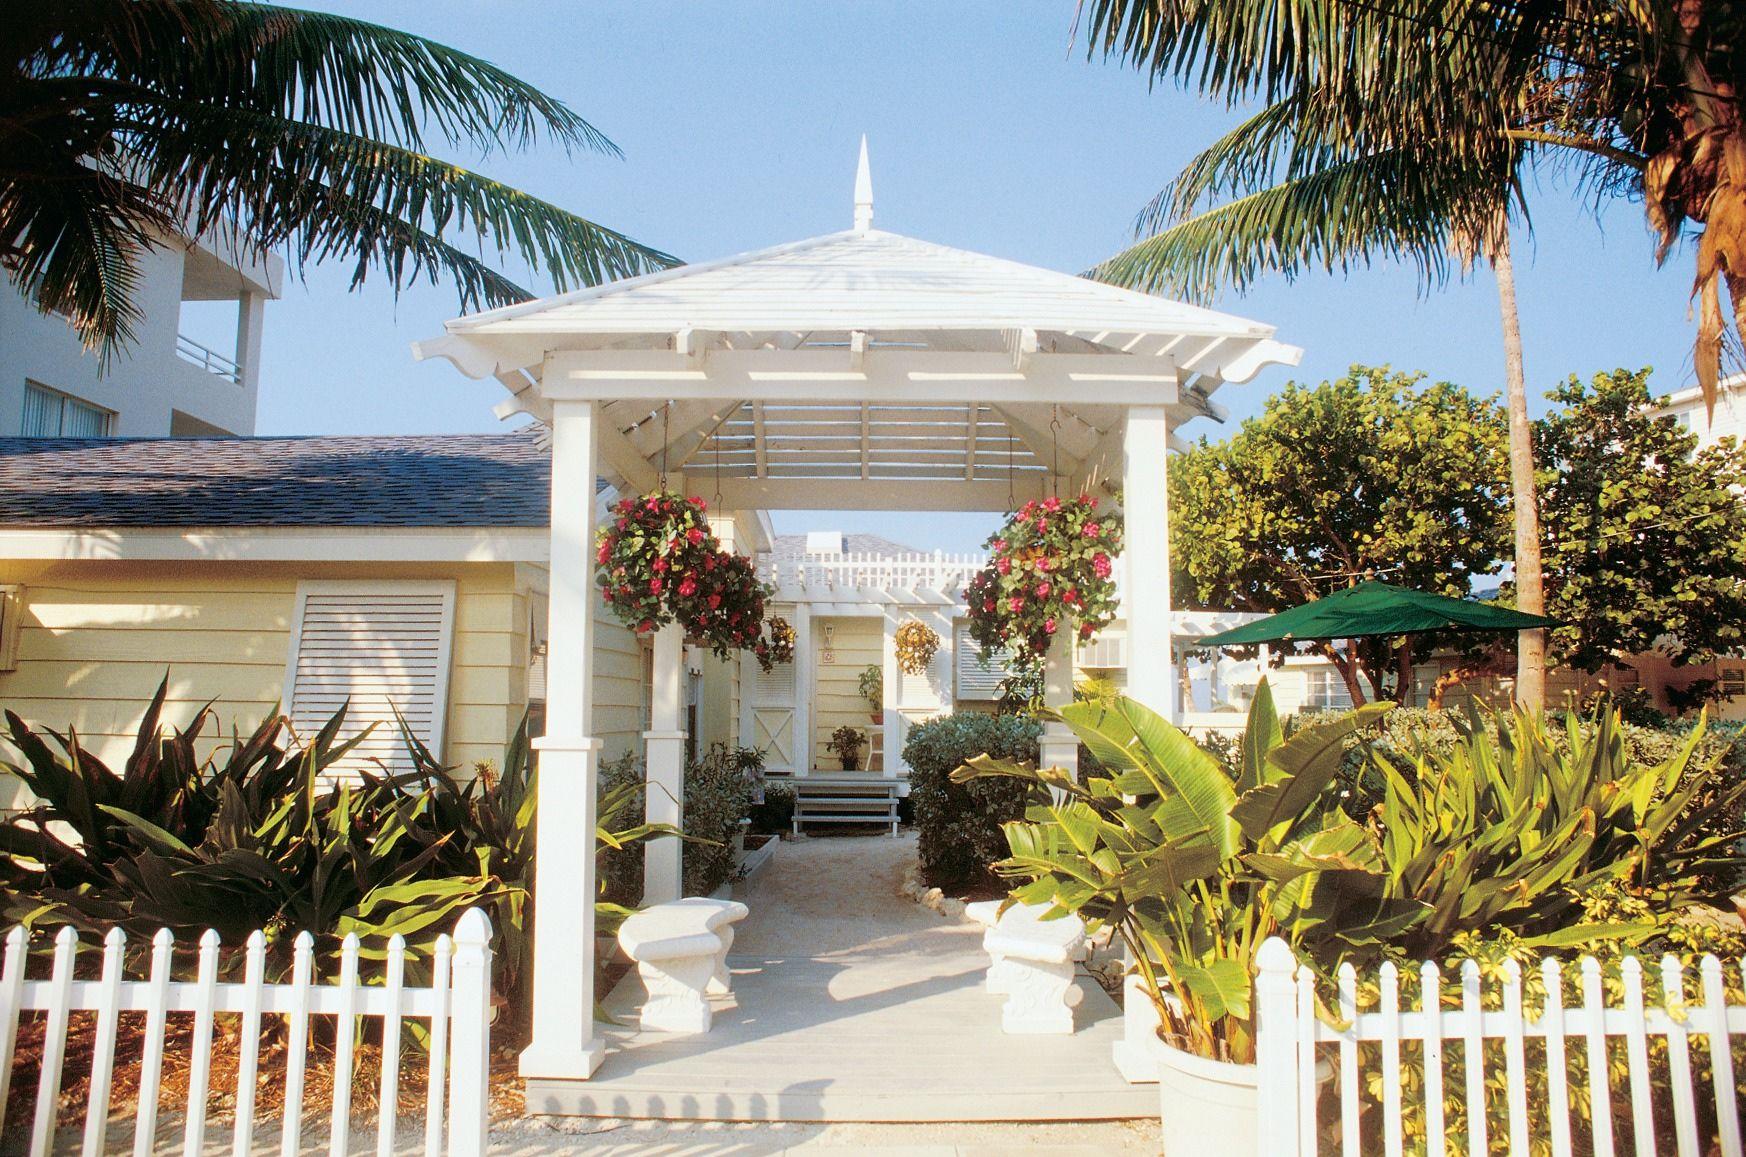 Unique Bungalow Beach Resort Bradenton Florida Check More At Http Www